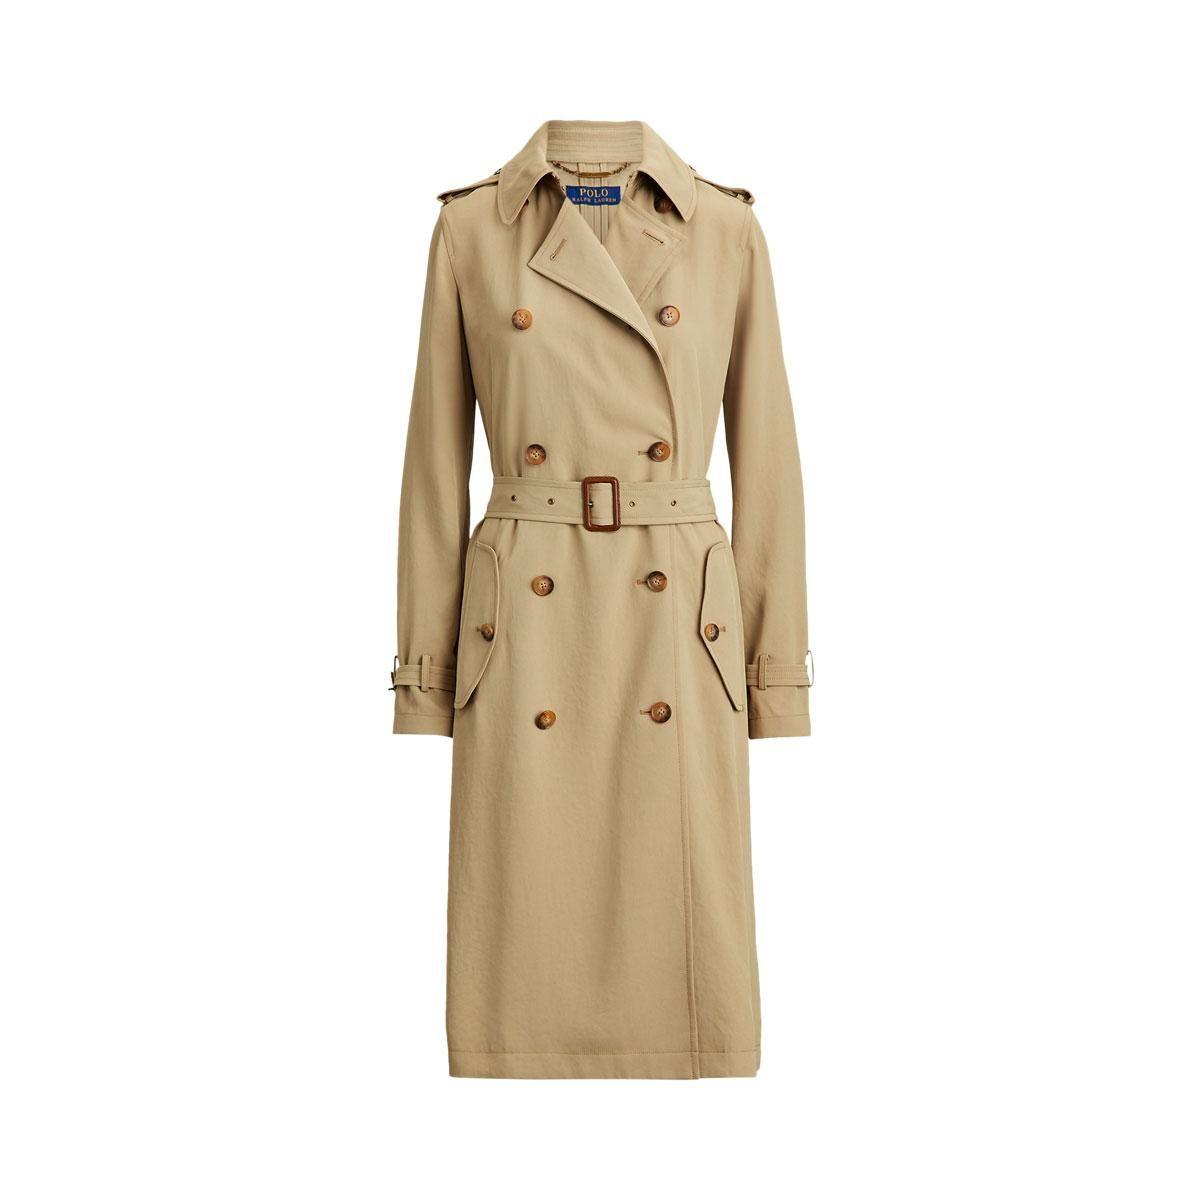 polo ralph lauren twill trench coat